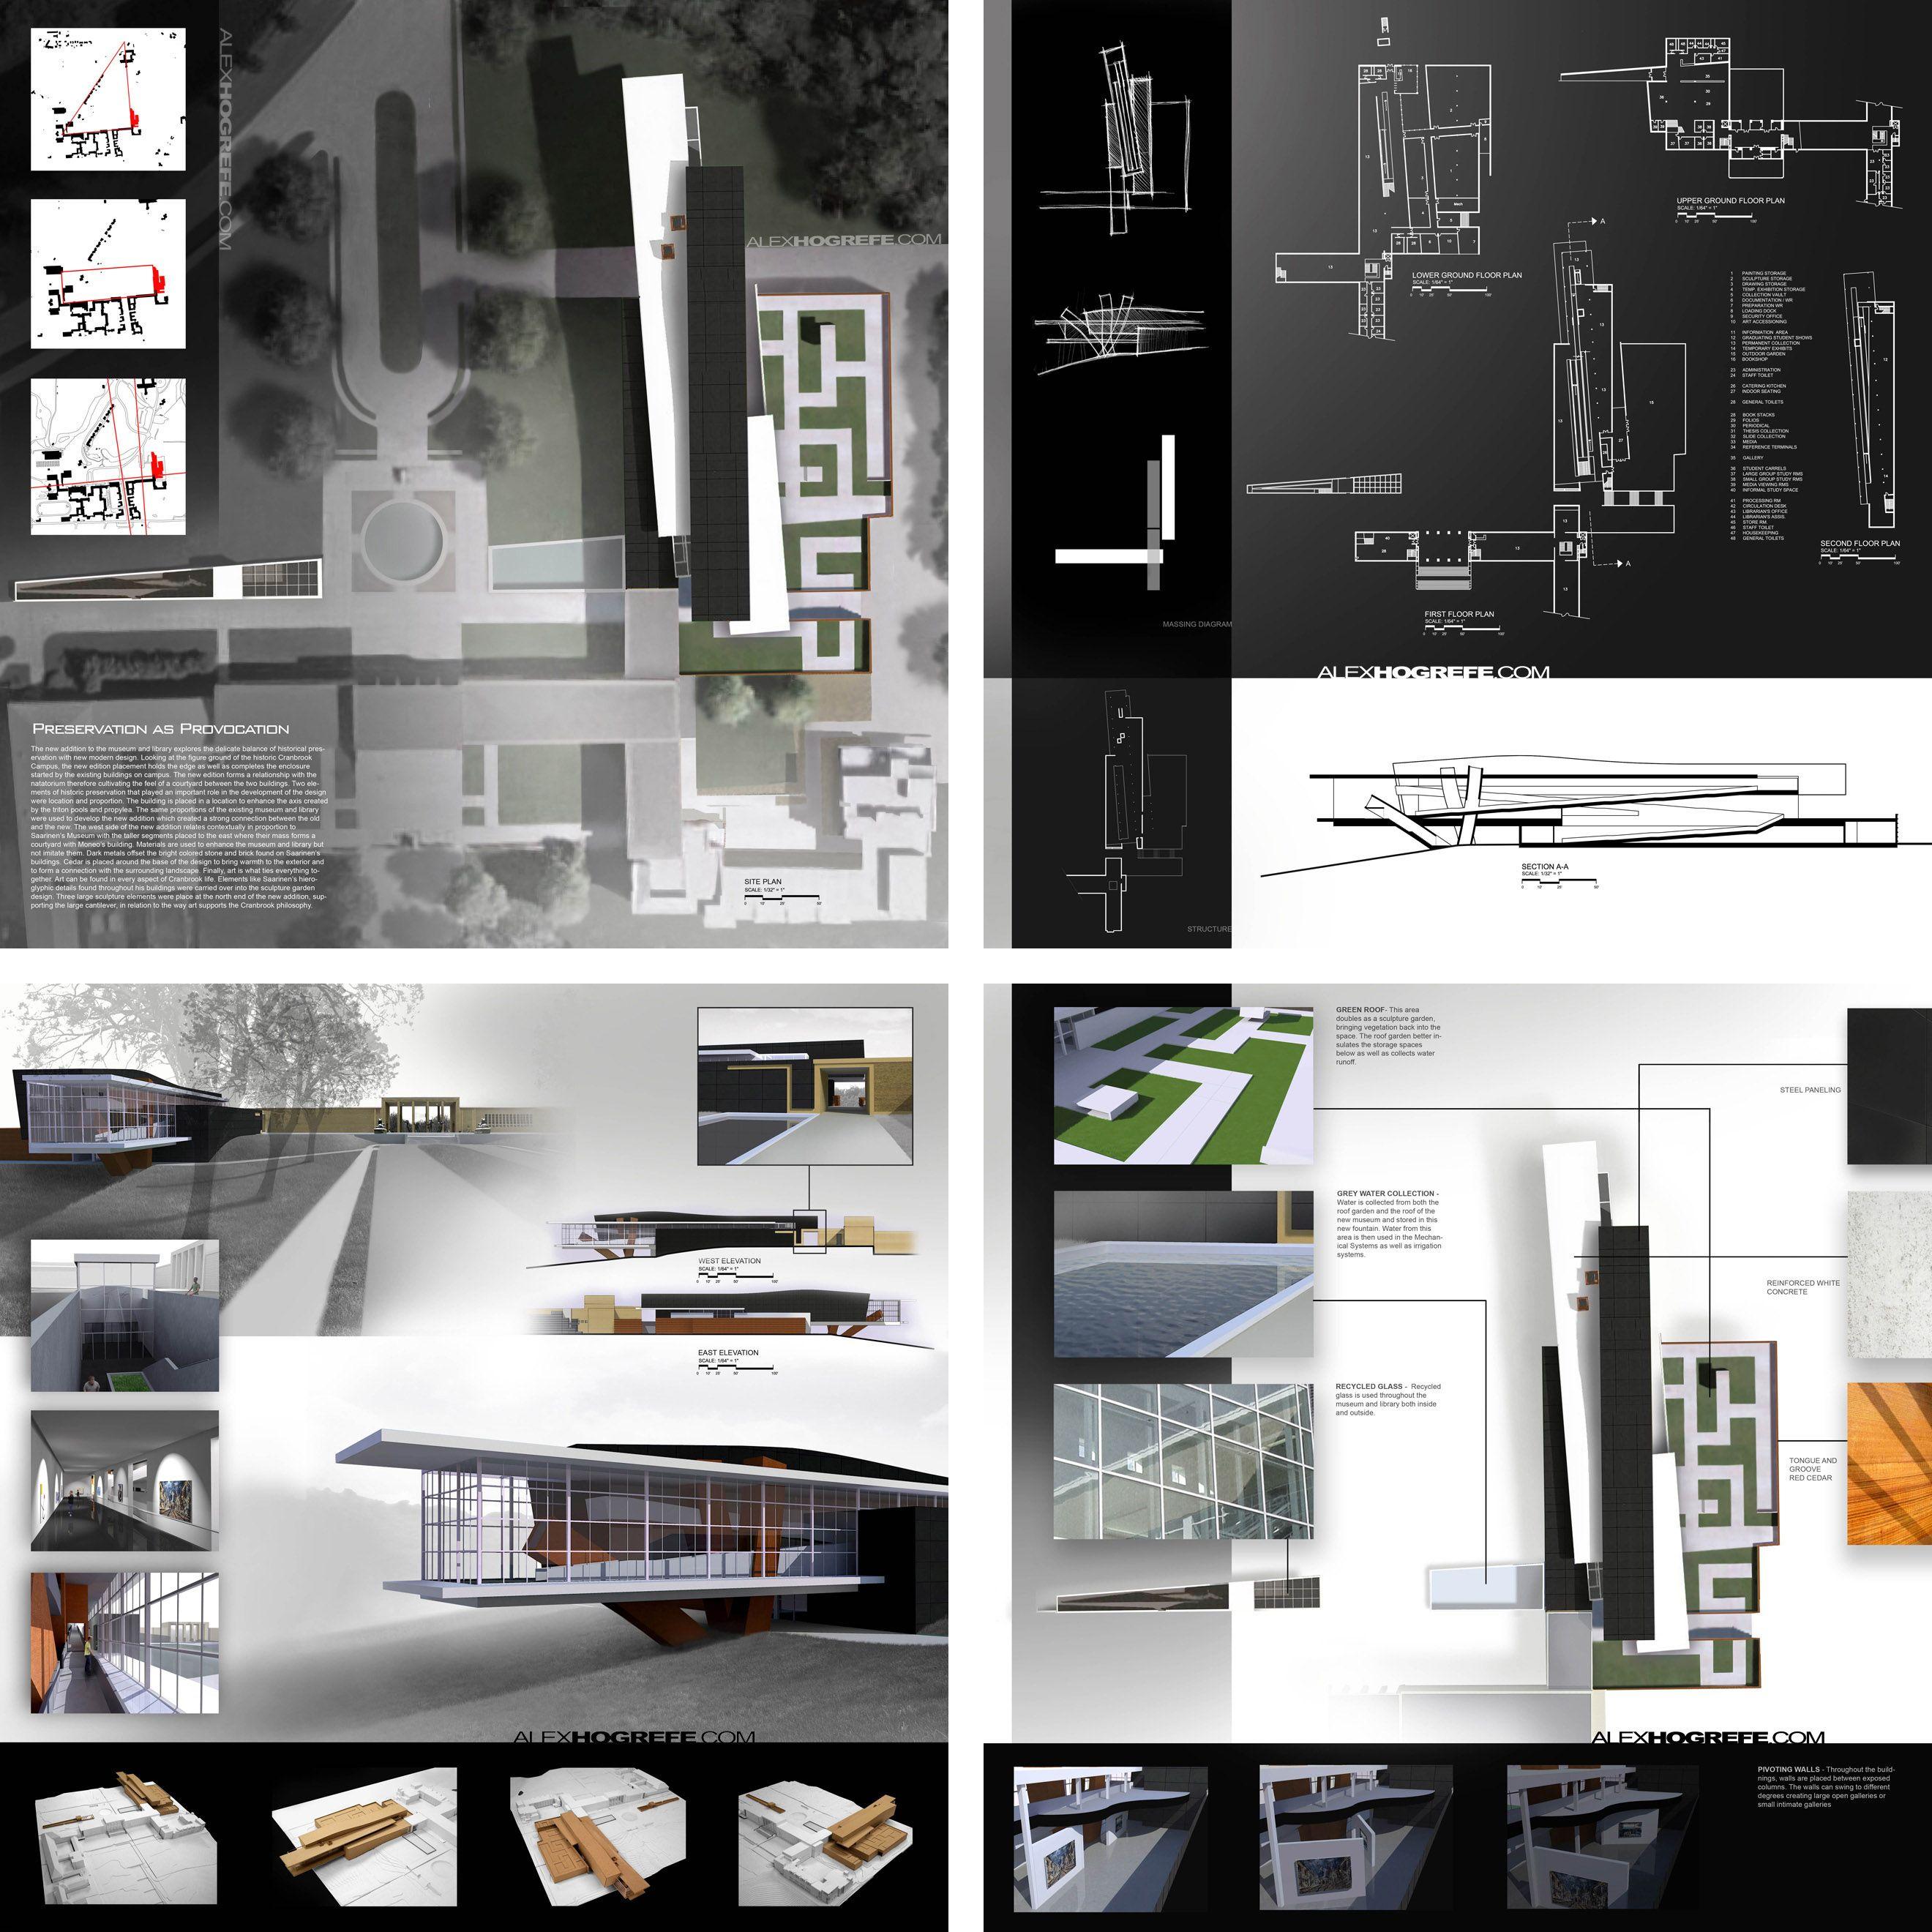 Past Presentation Boards Part 2 Visualizing